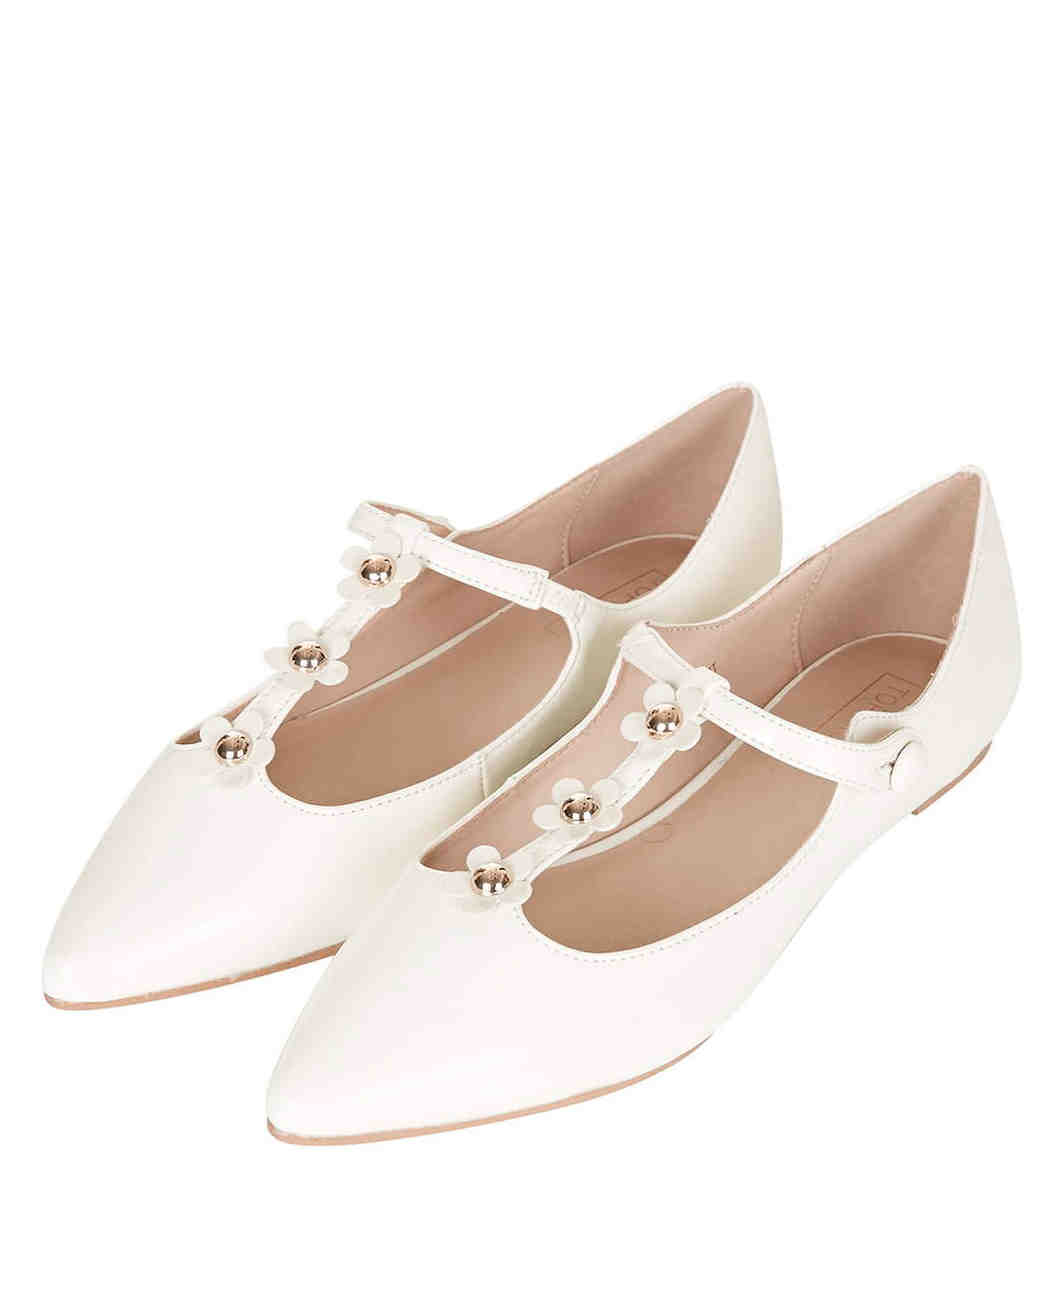 summer-wedding-shoes-topshop-sunshine-t-bar-shoes-0515.jpg